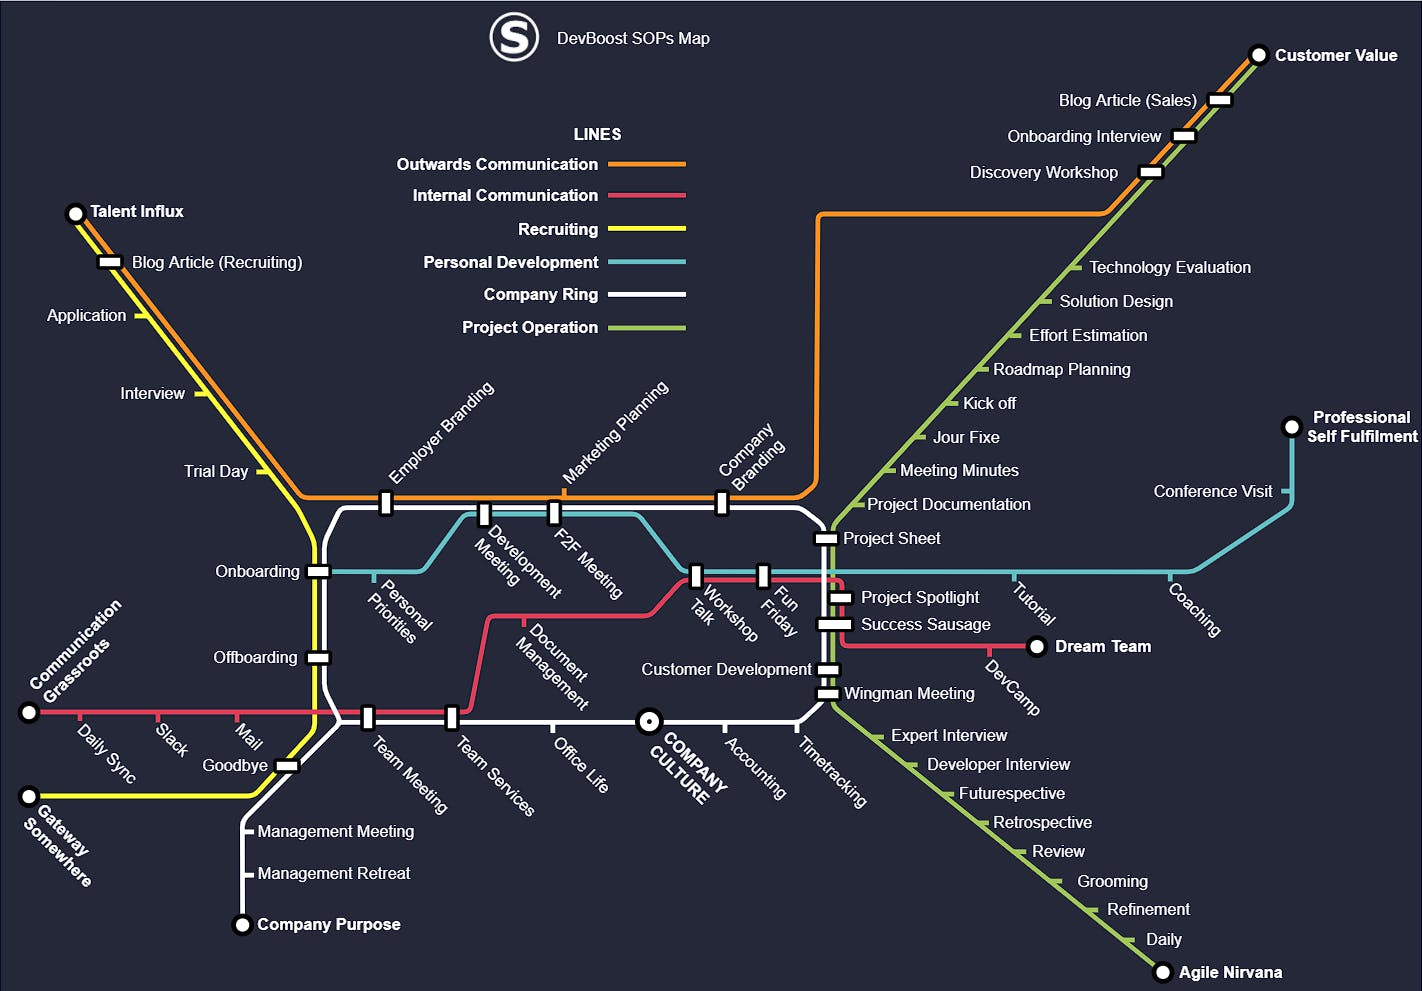 SOP Map